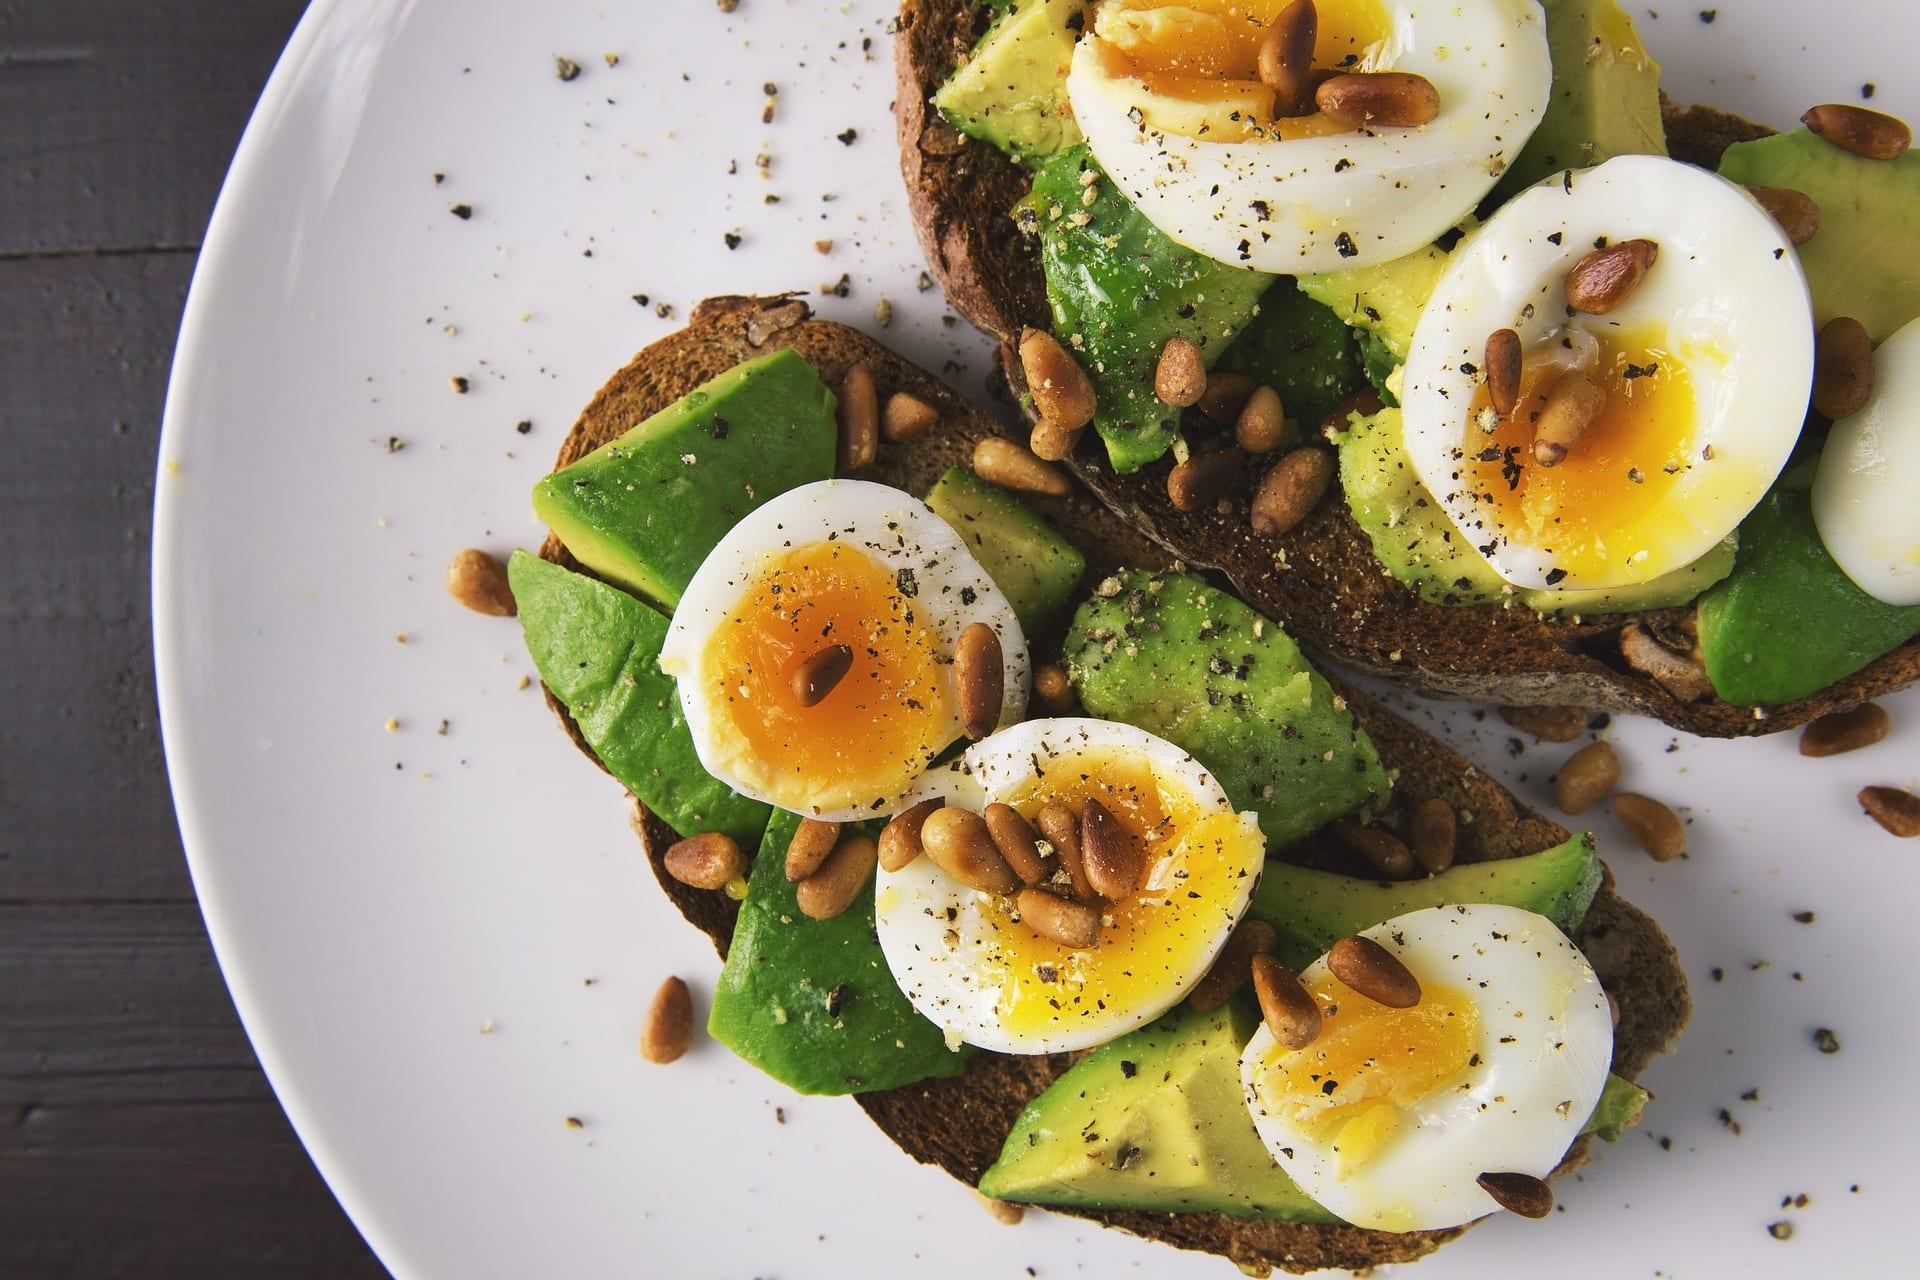 avocado egg breakfast - caribbean yoga retreat